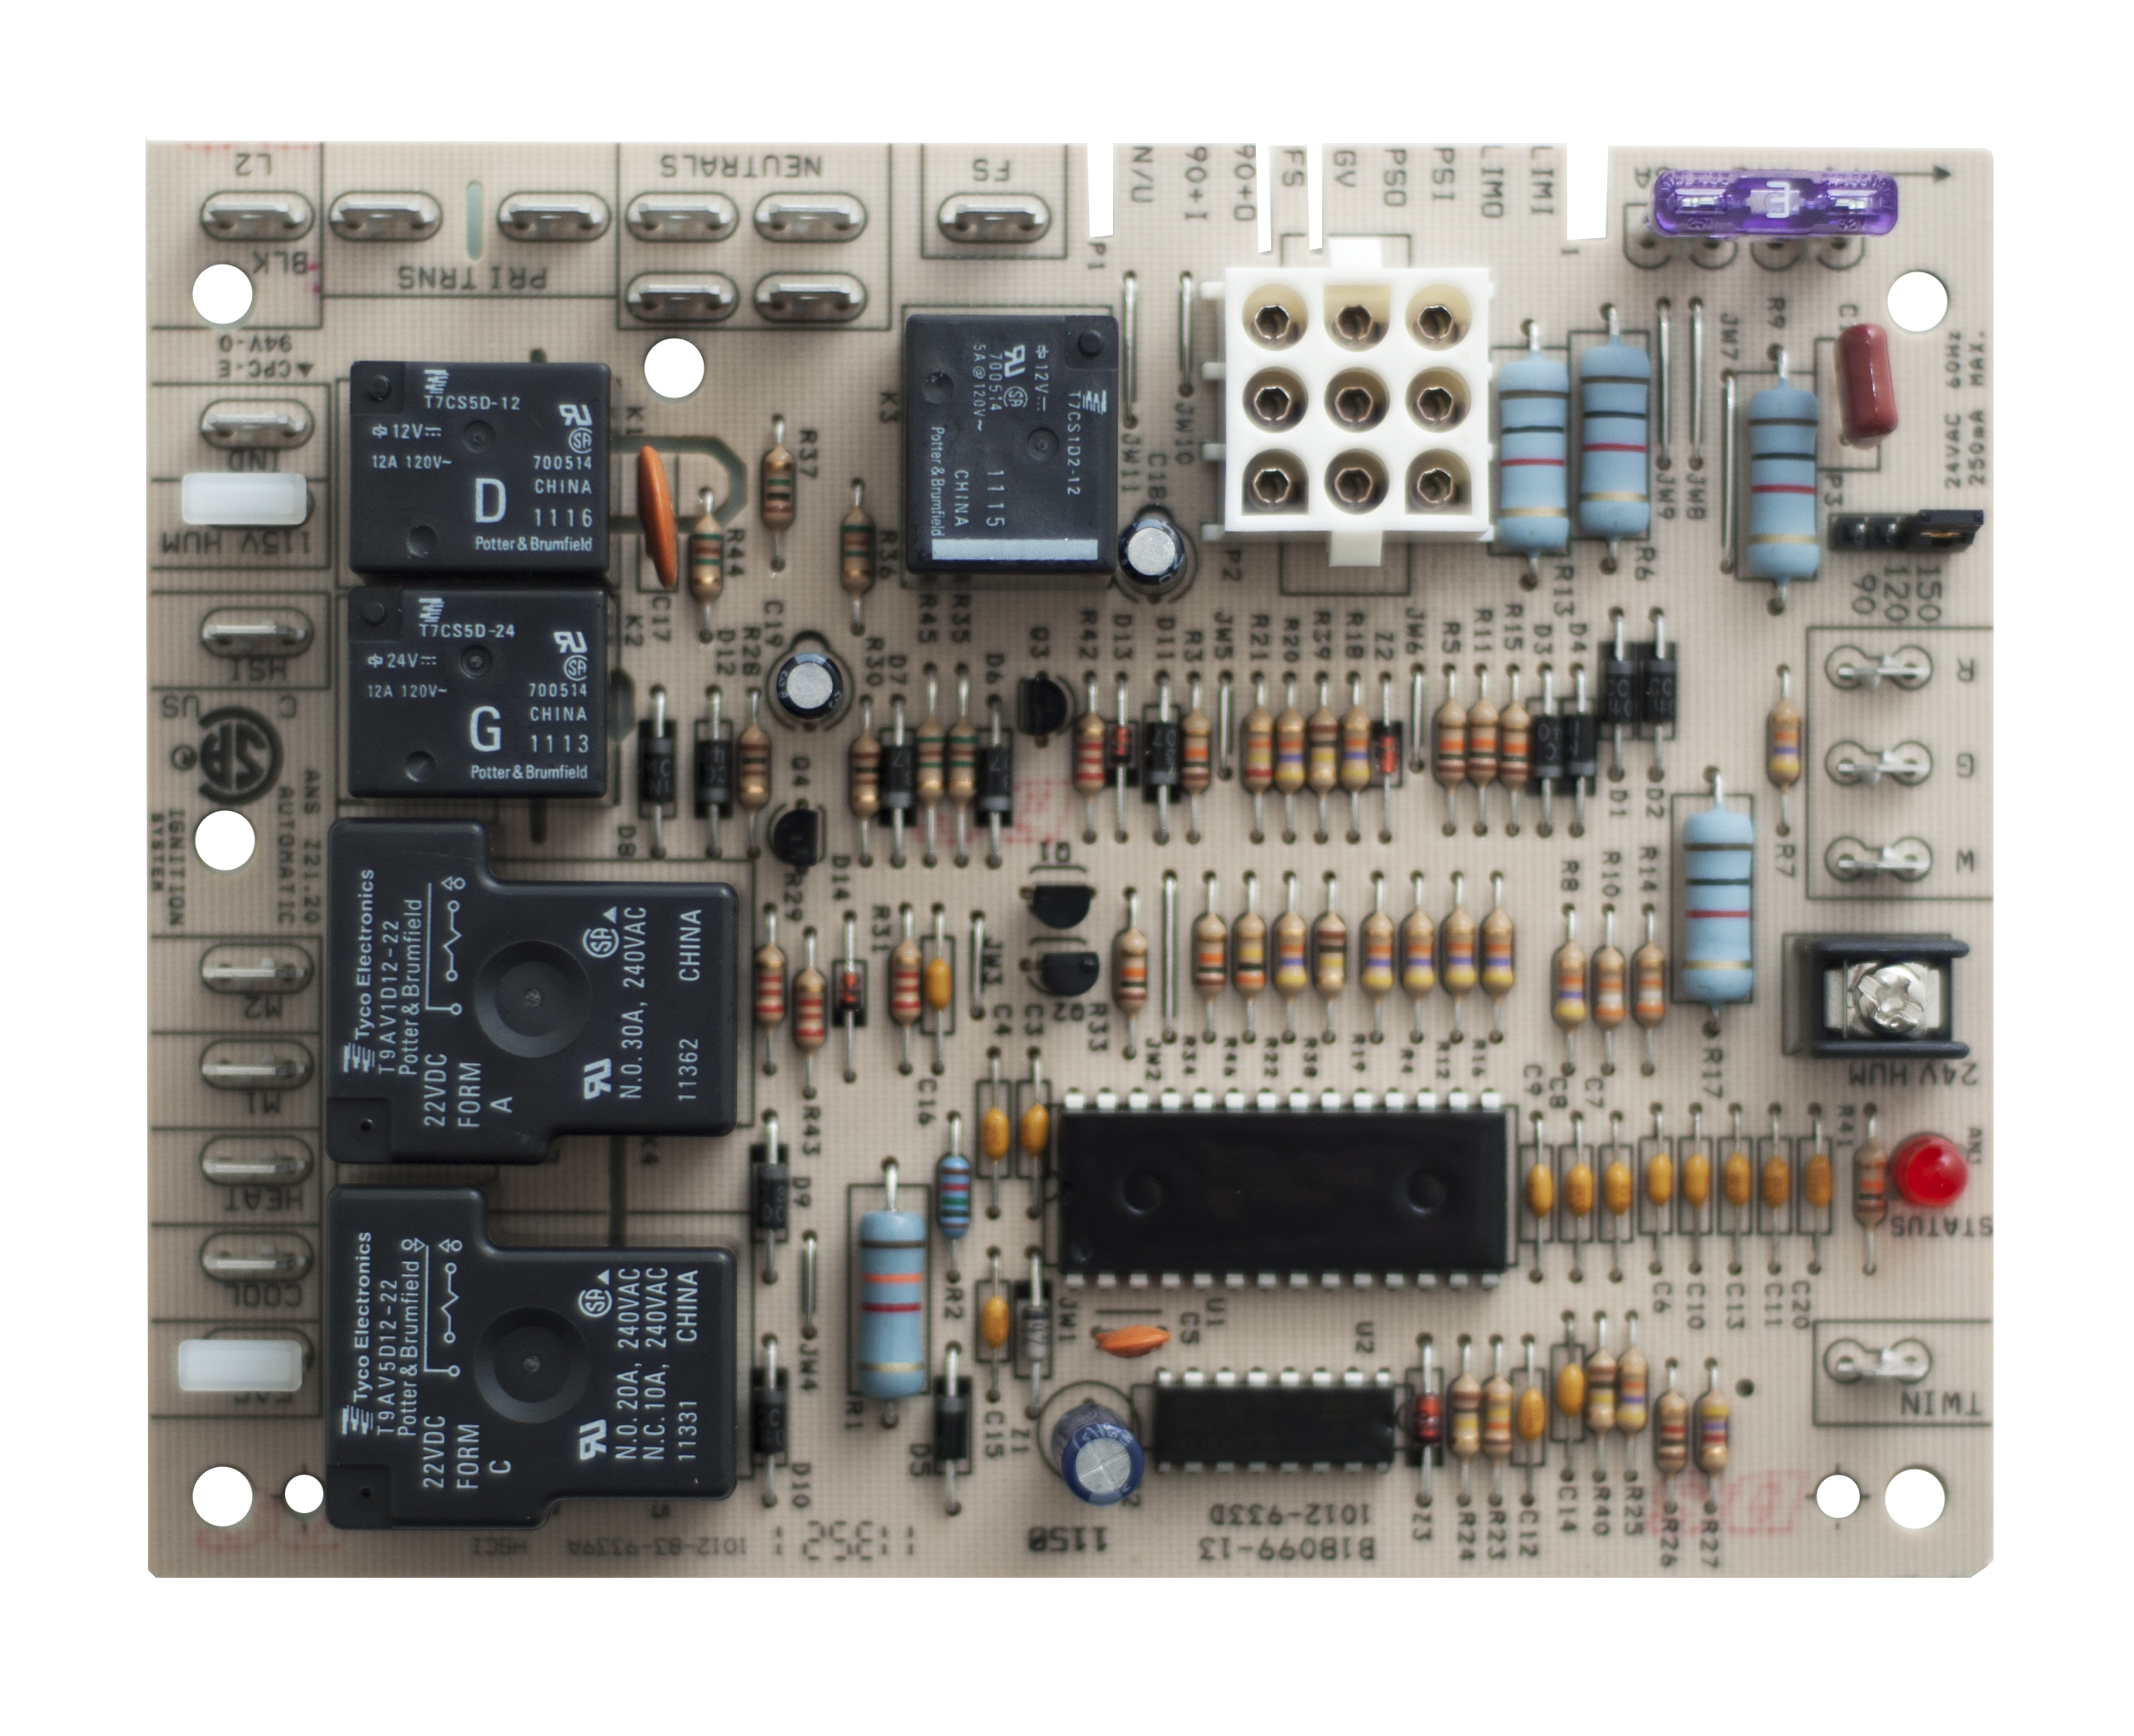 janitrol furnace thermostat wiring diagram 2004 jeep grand cherokee laredo radio circuit board — b1809913s goodman/janitrol control | goodman repair parts